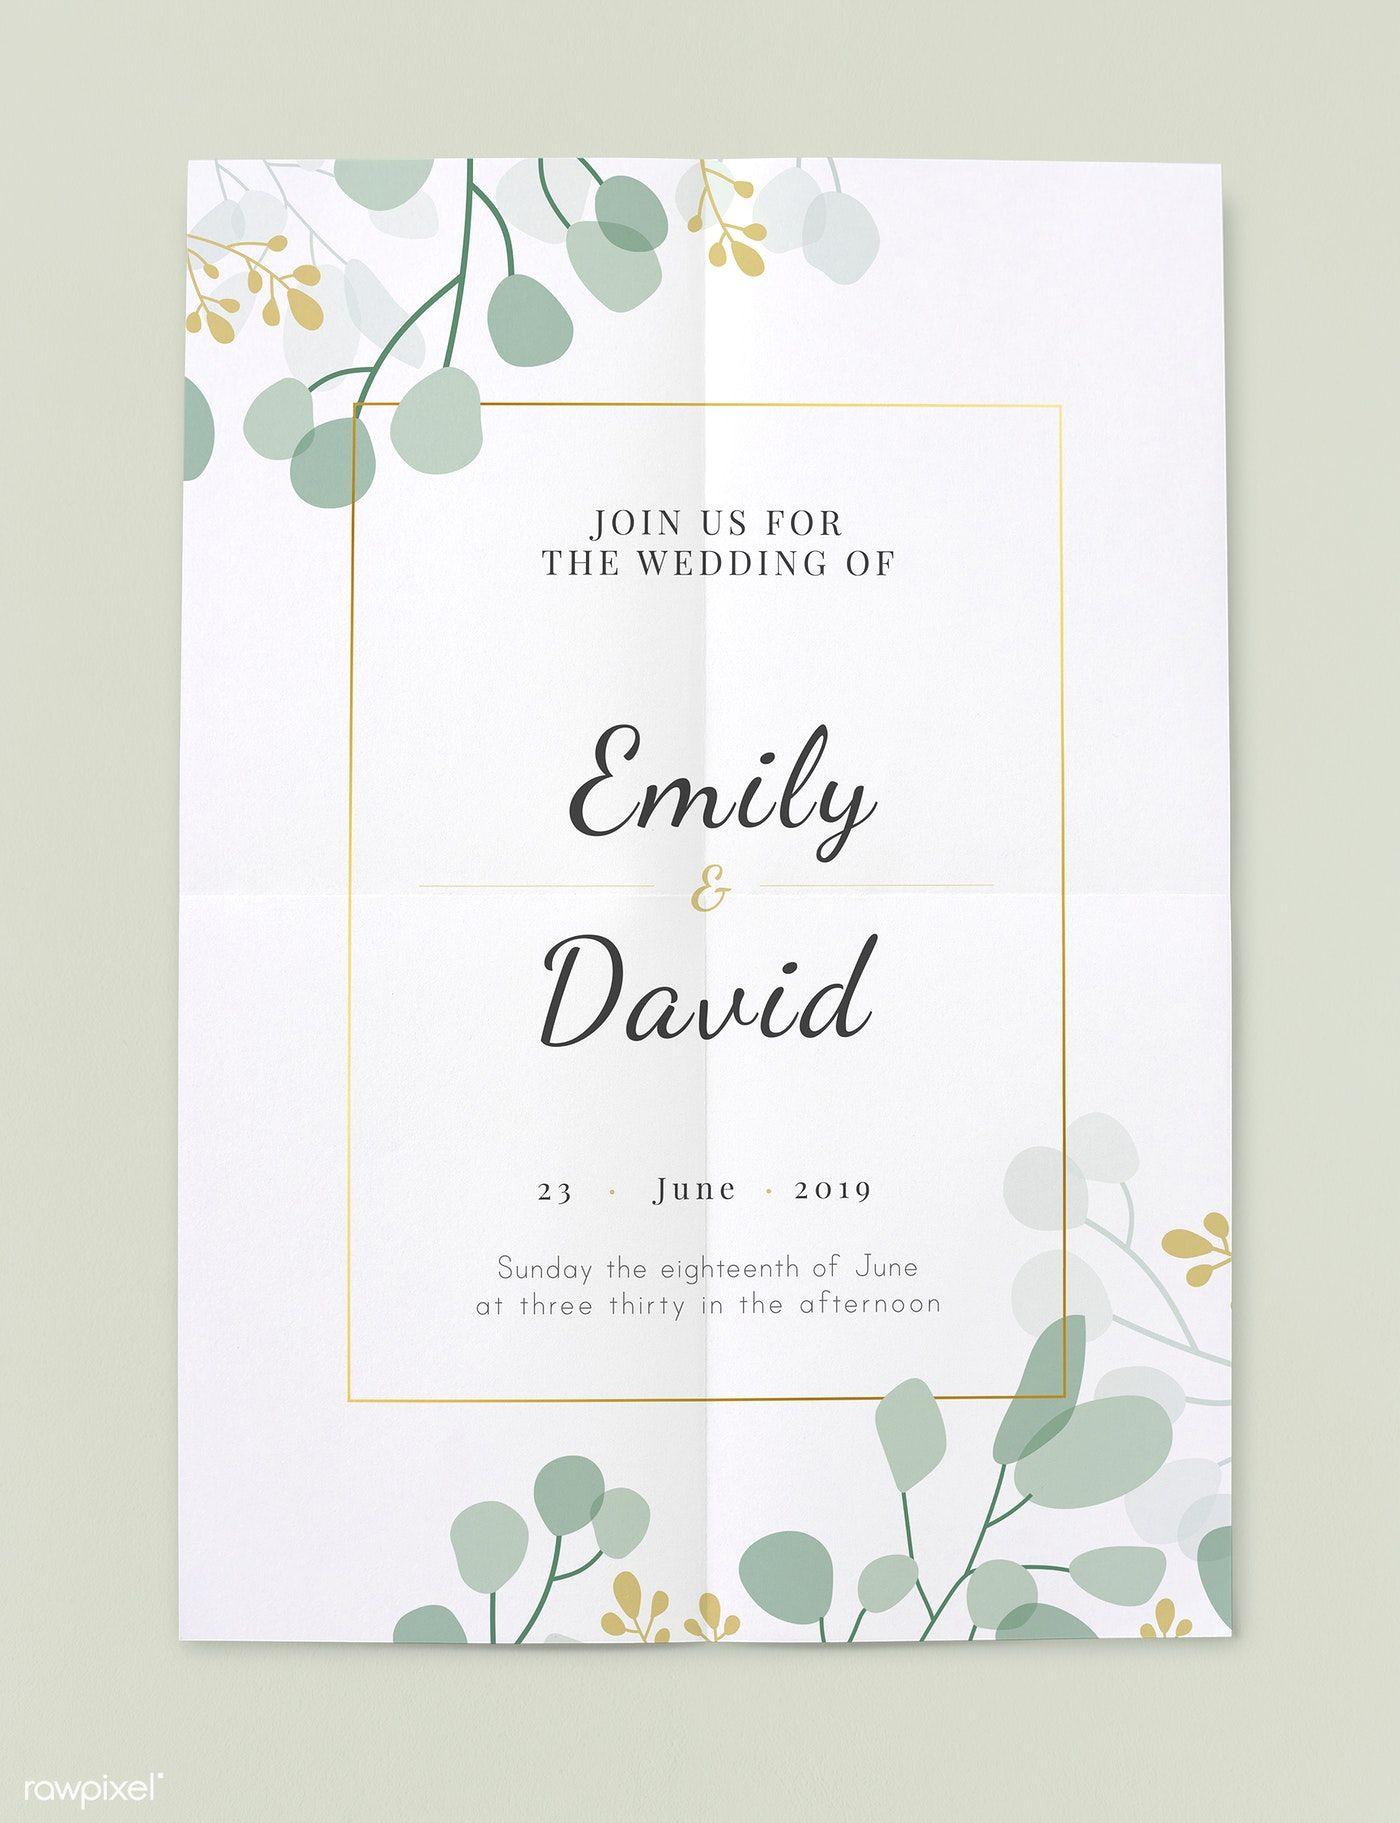 Download Premium Psd Of Wedding Invitation Card 545575 Wedding Invitations Wedding Invitation Card Template Wedding Invitation Vector